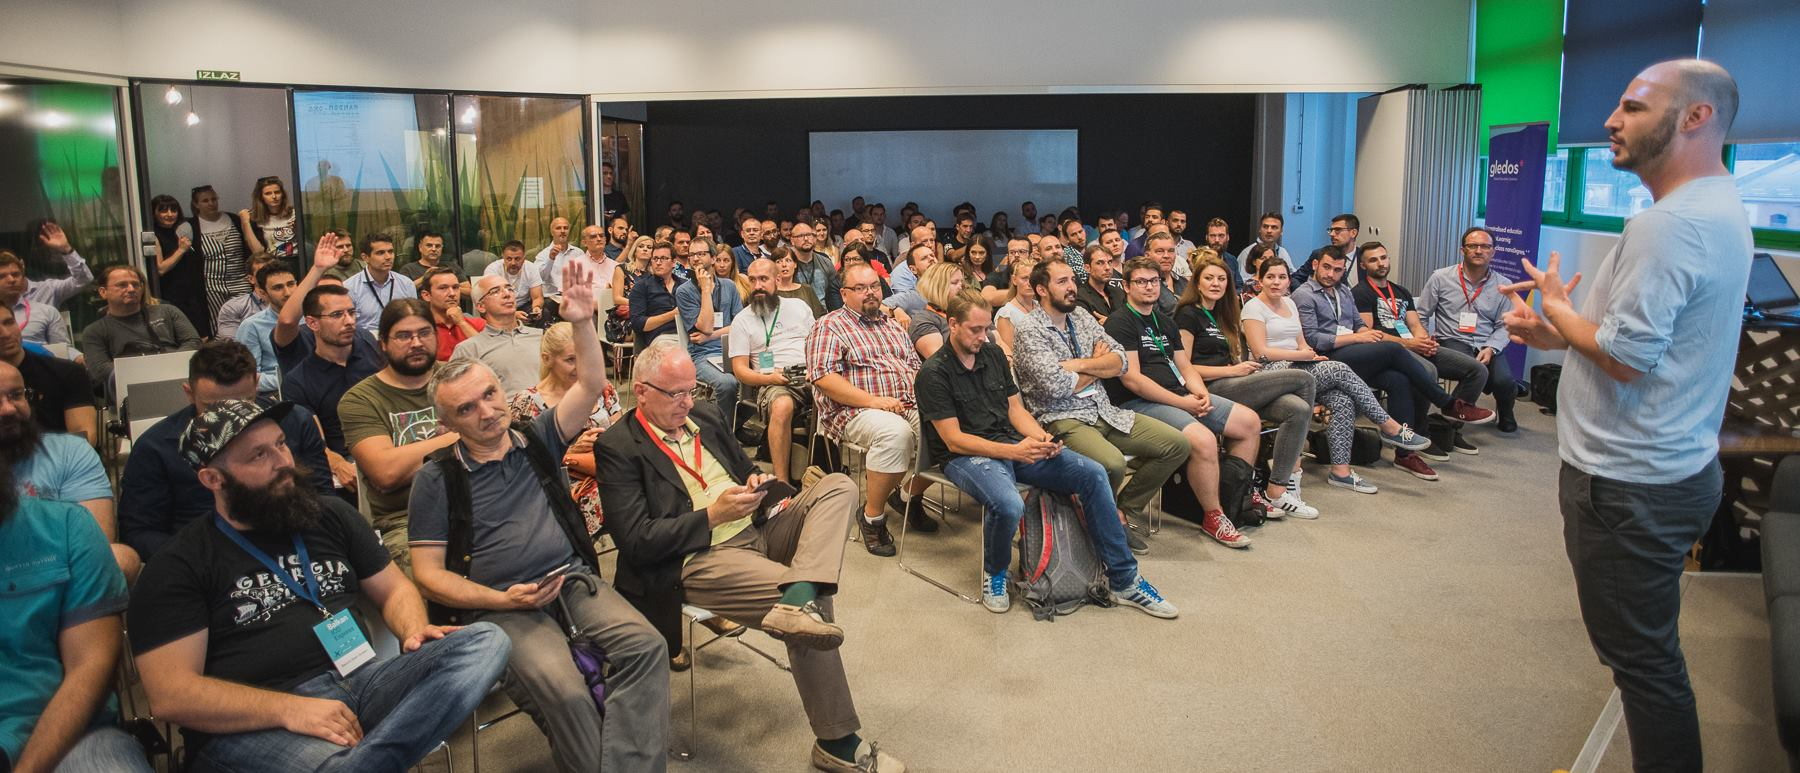 Održan Balkan ICO Express & Blockchain Meetup